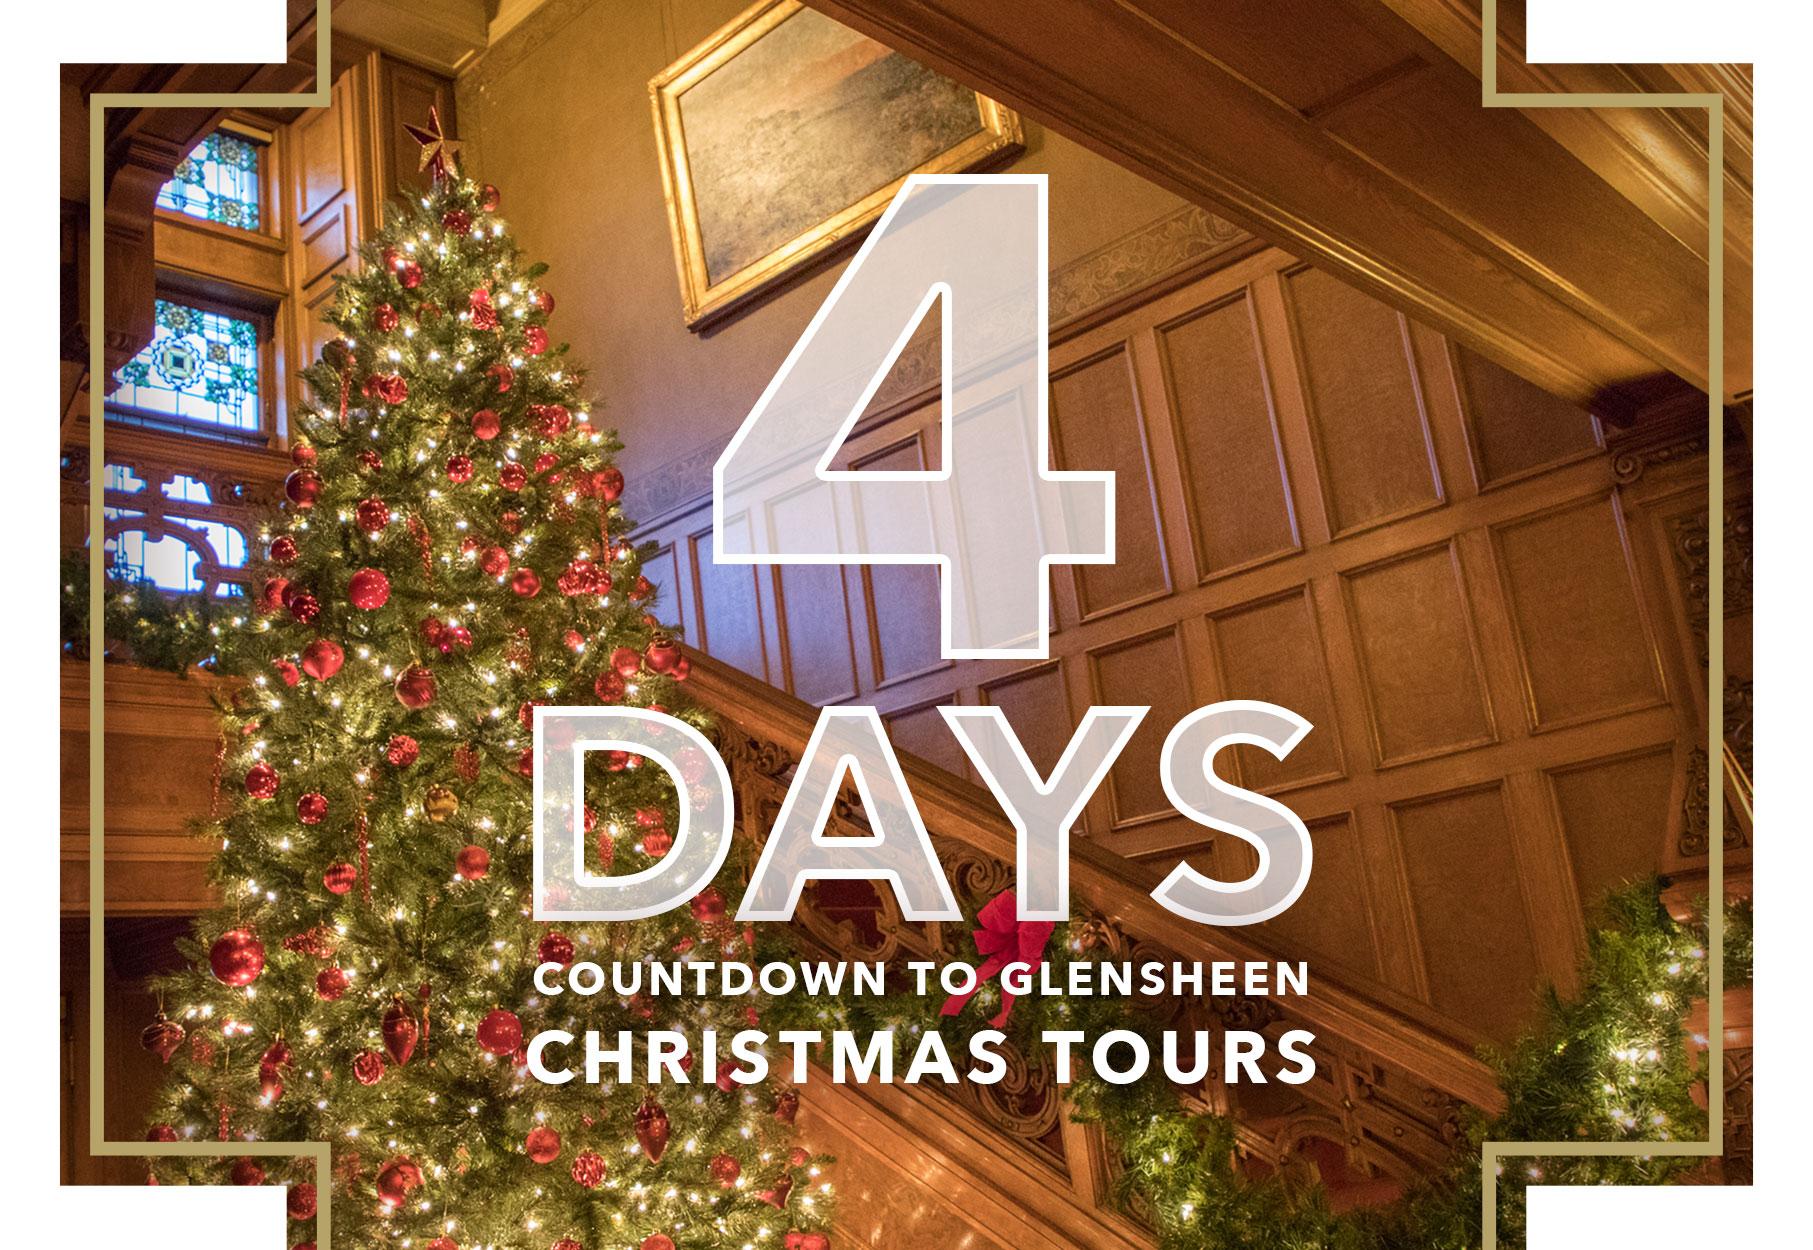 Until Christmas 10 Weeks Till Christmas.4 Days Until Christmas Tours Glensheen